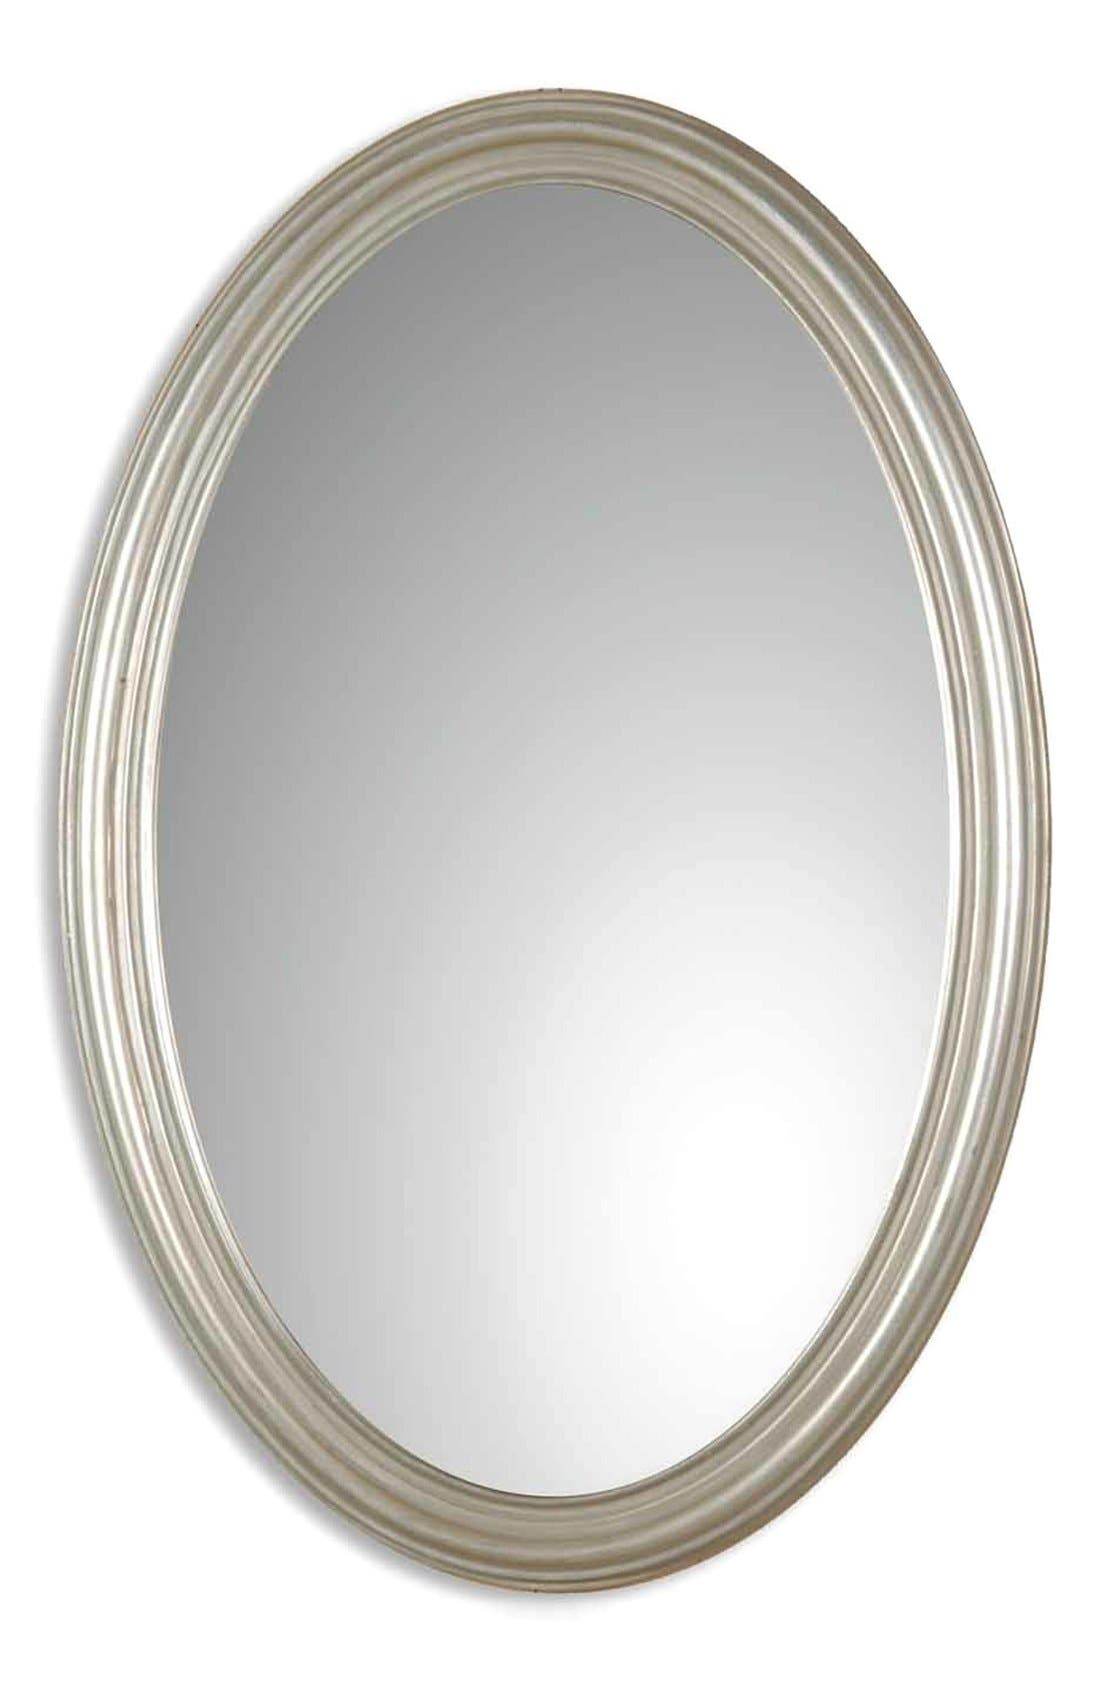 'Franklin' Wall Mirror,                             Main thumbnail 1, color,                             Silver